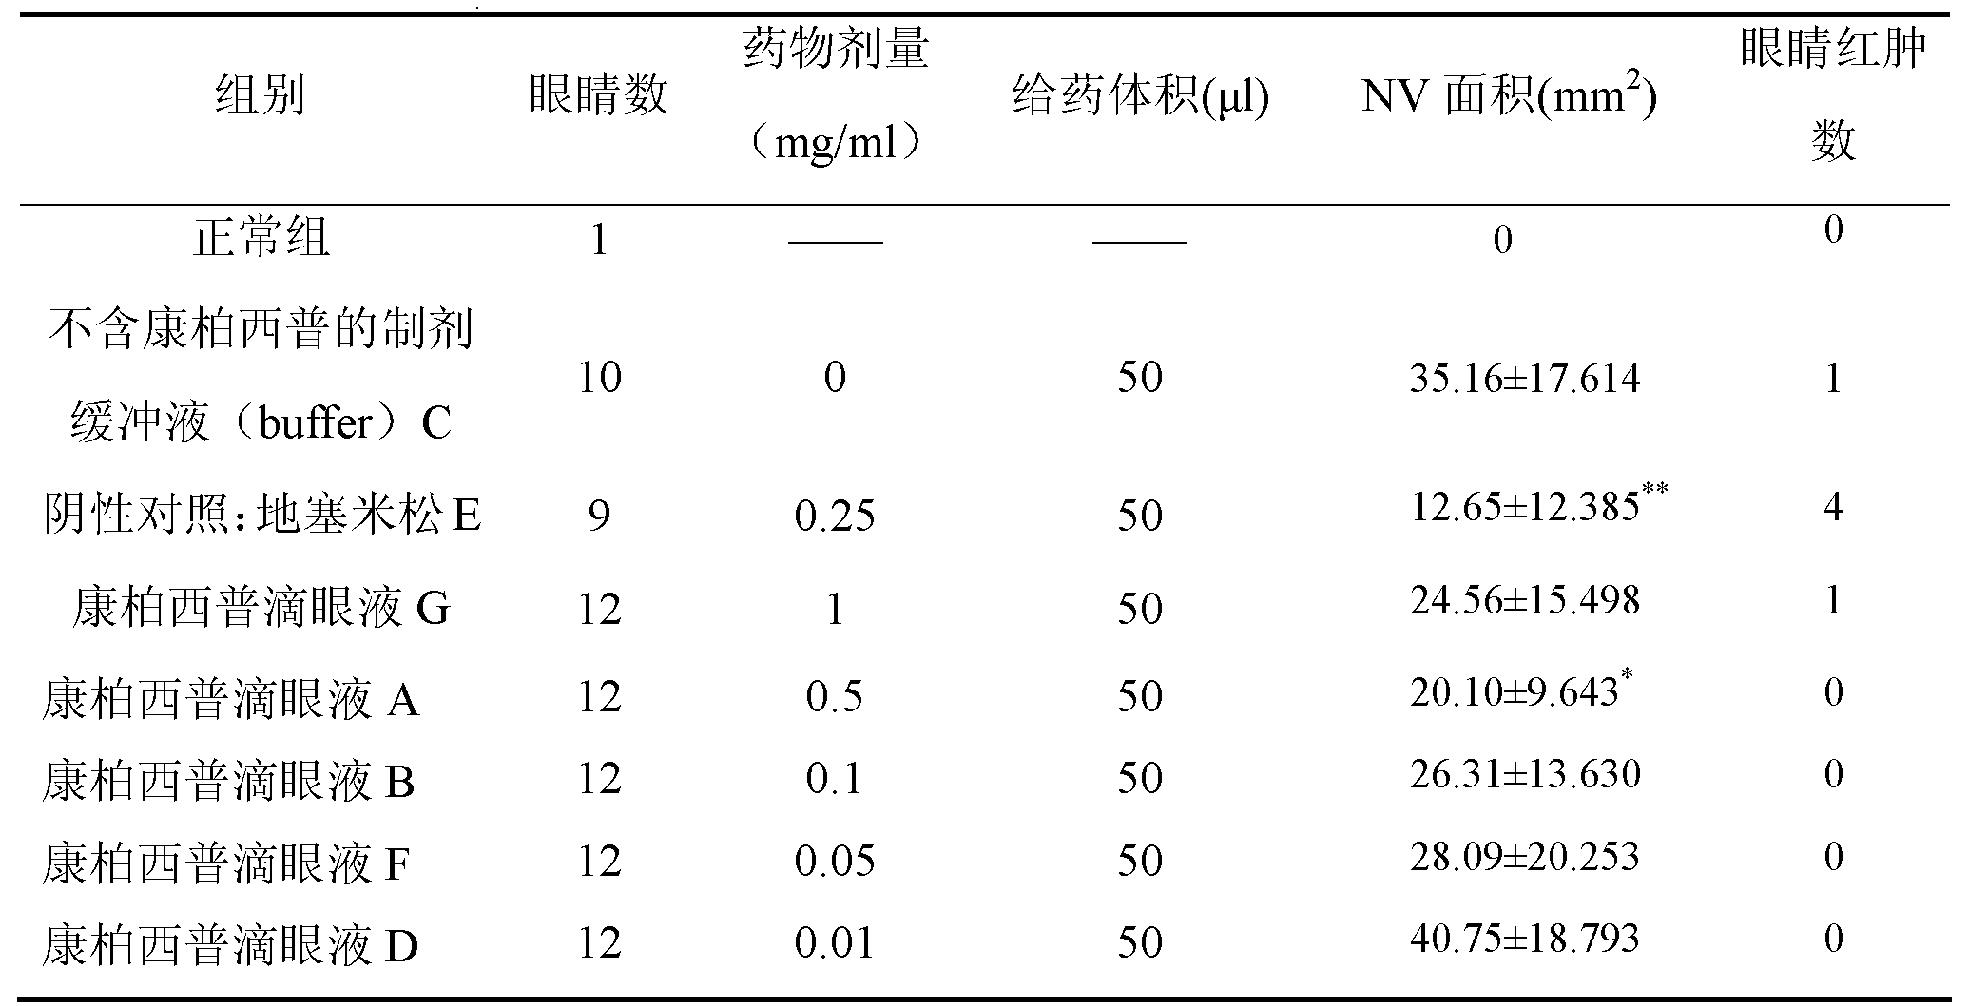 CN103212075A - 一種含有vegf拮抗劑的滴眼液 - Google Patents